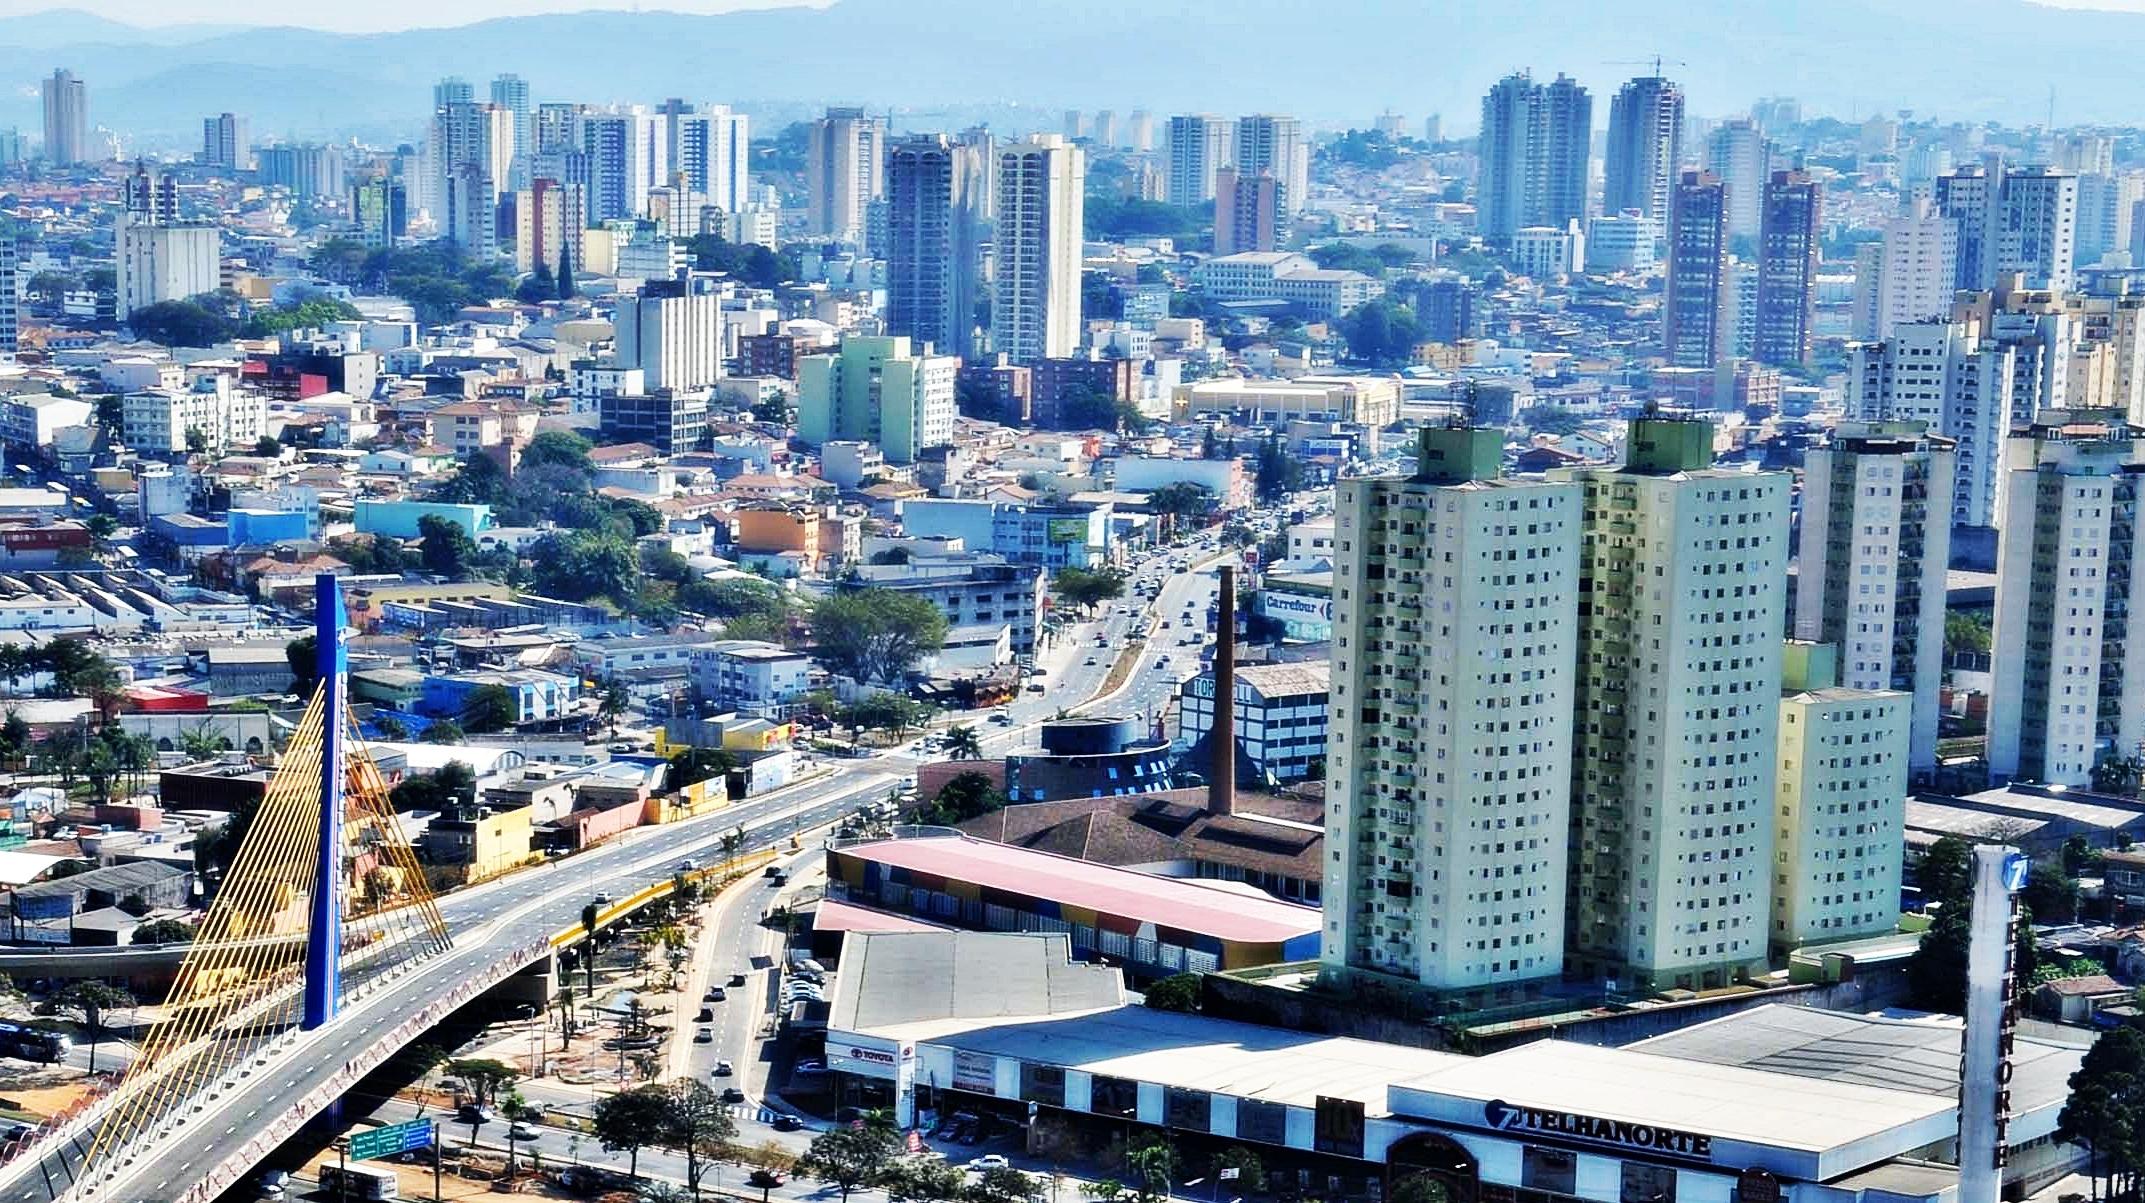 Guarulhos São Paulo fonte: upload.wikimedia.org